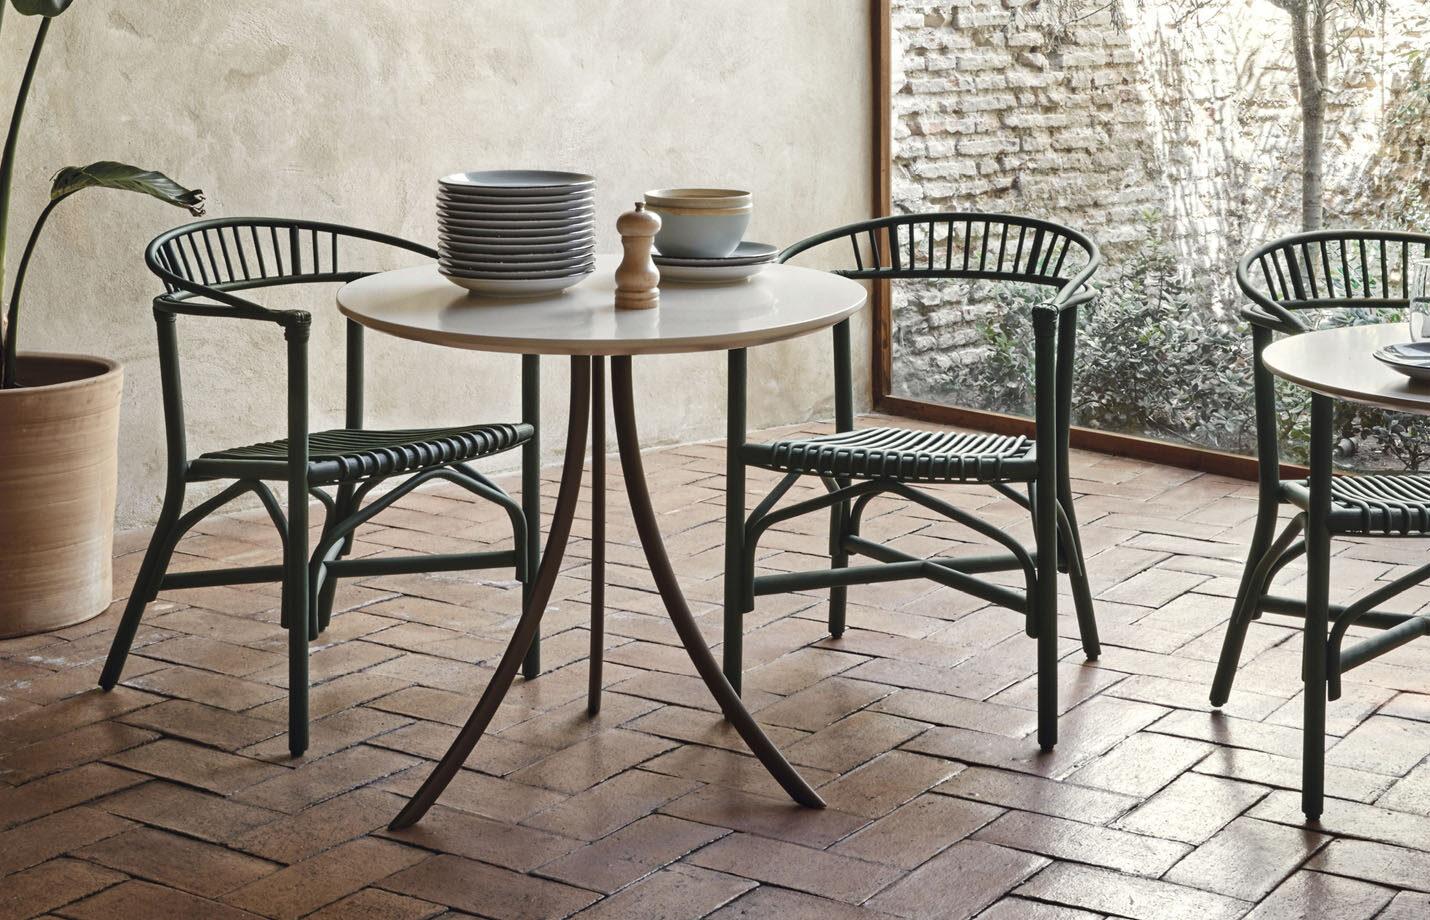 Altet-Rattan-dining-armchair-LS1